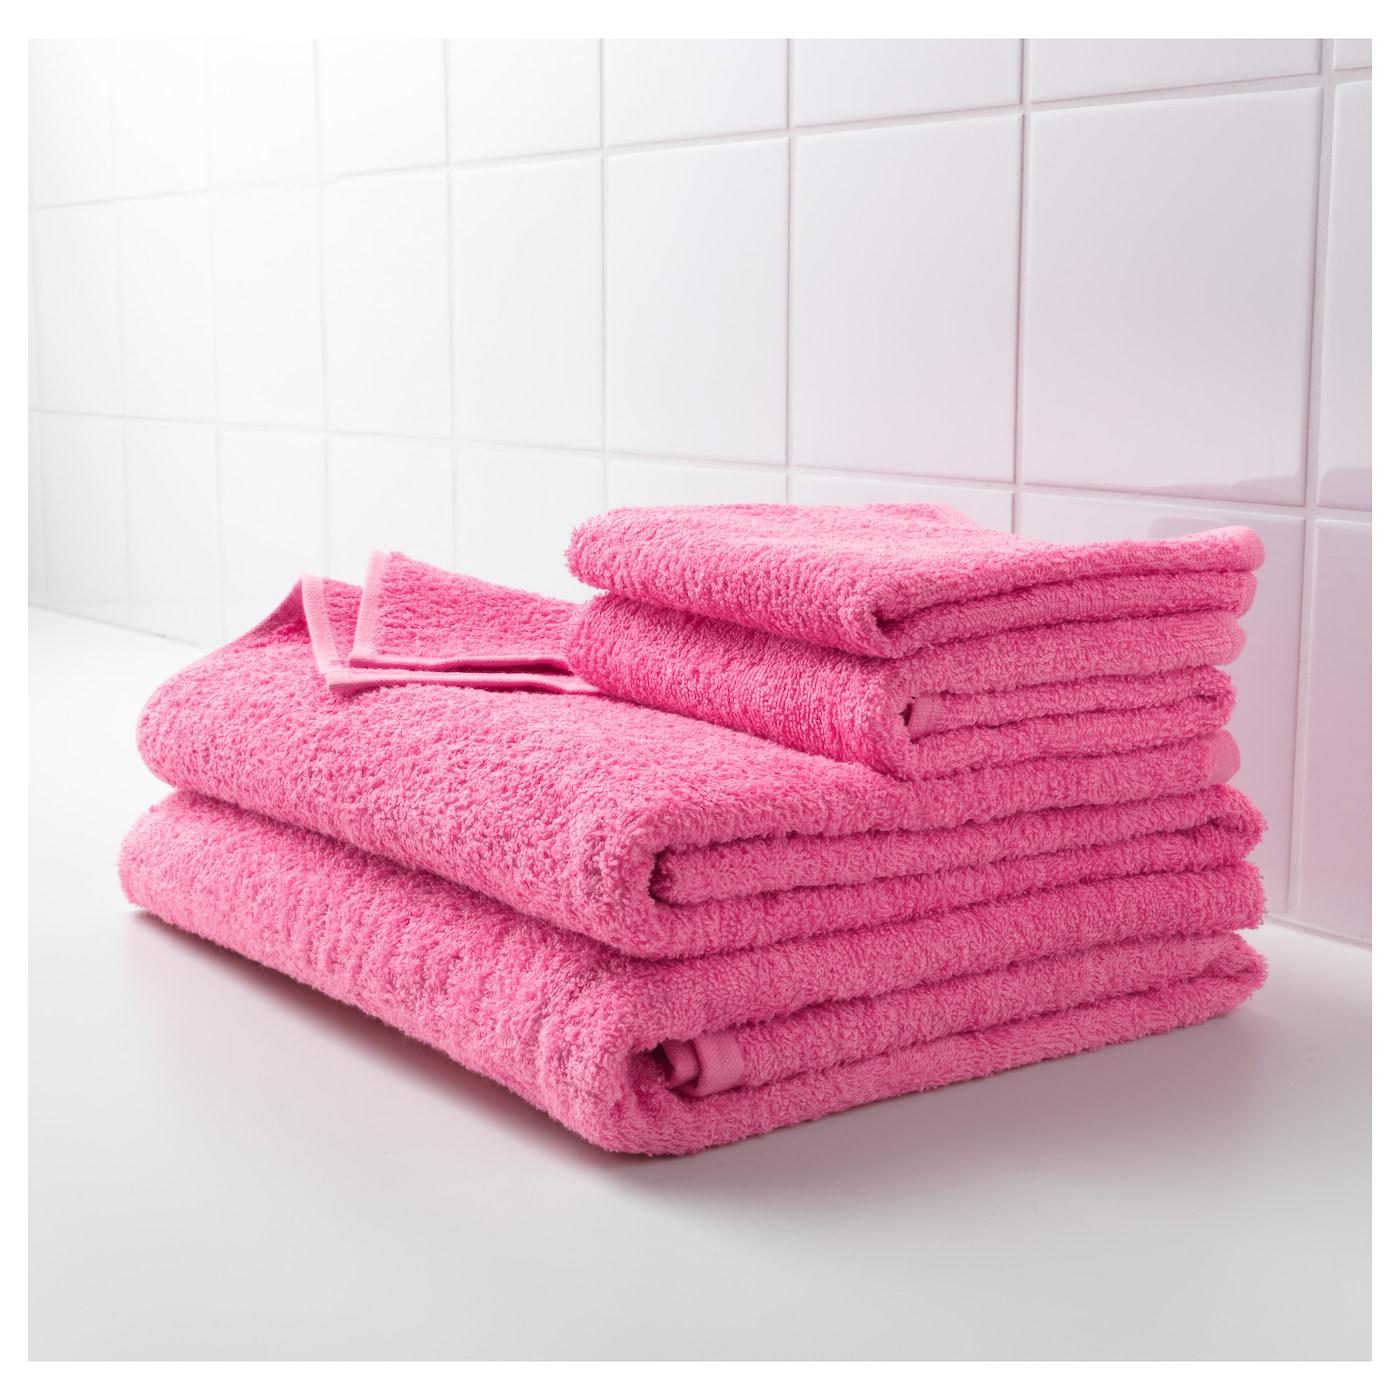 h ren bath towel pink 70x140 cm ikea. Black Bedroom Furniture Sets. Home Design Ideas